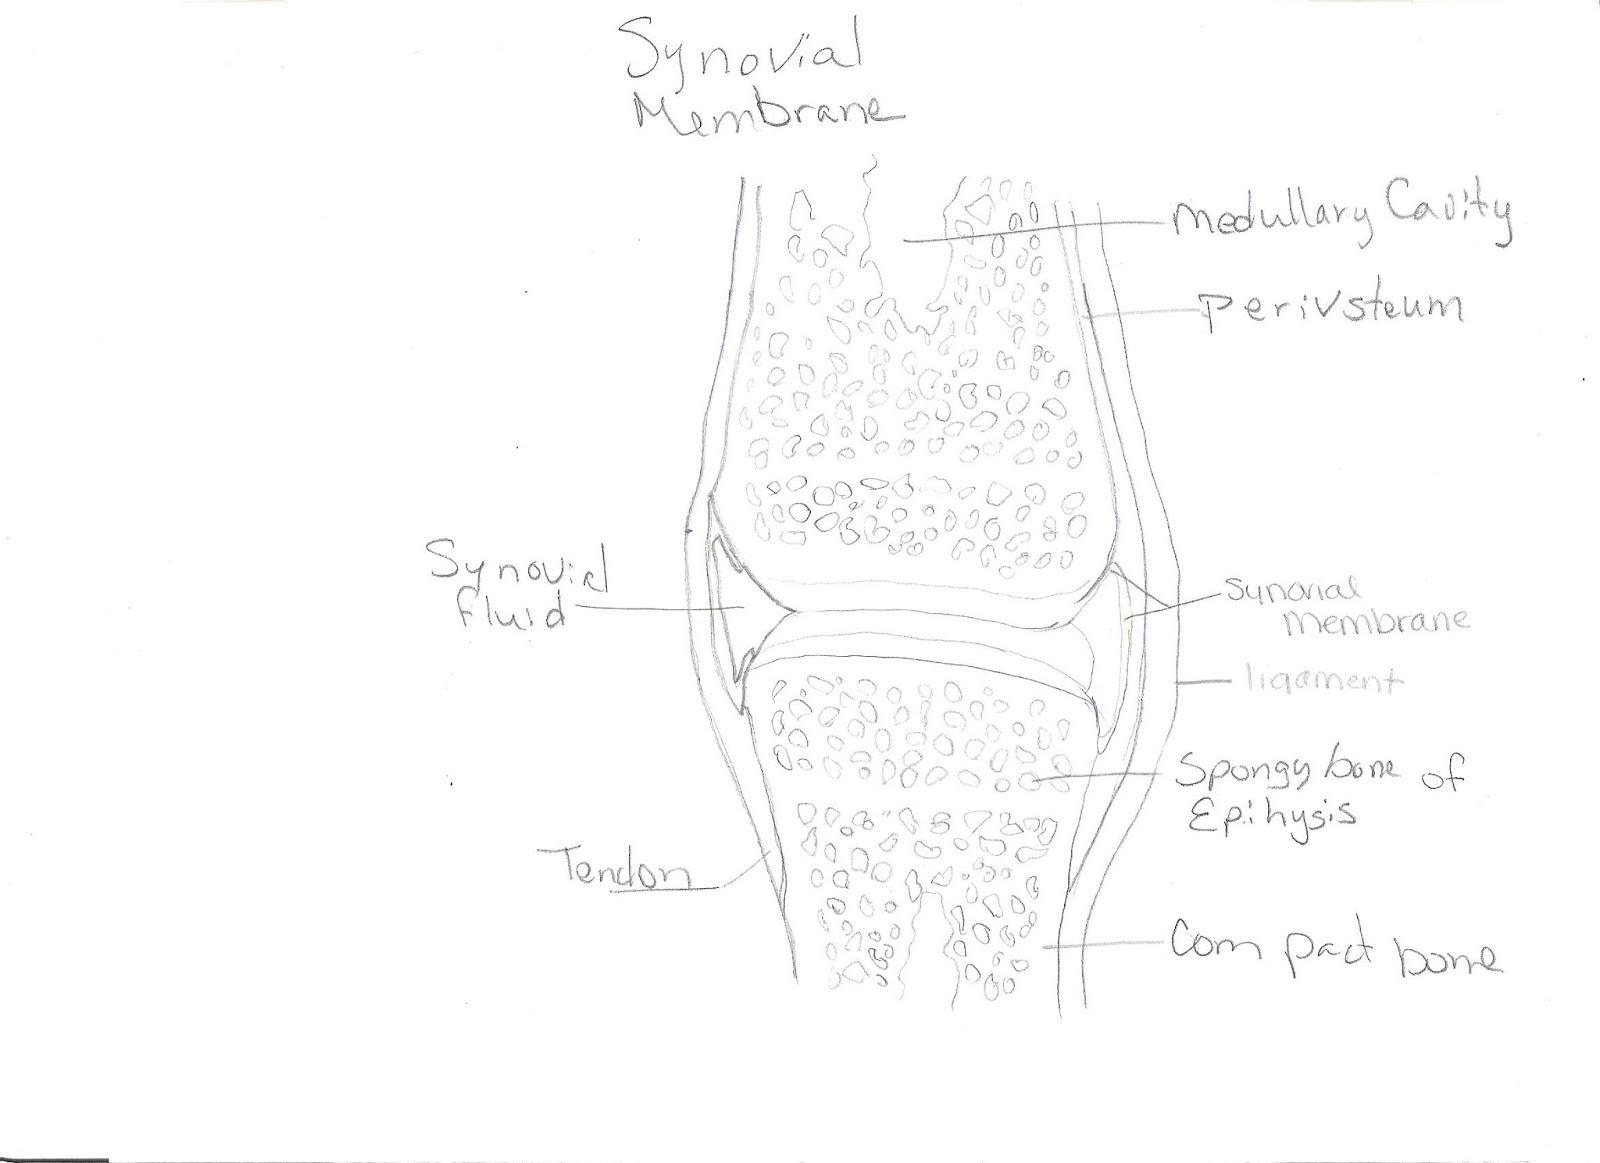 Walls Bio 156 Human Biology: Lab 4 Tissues, Skin & Membrane